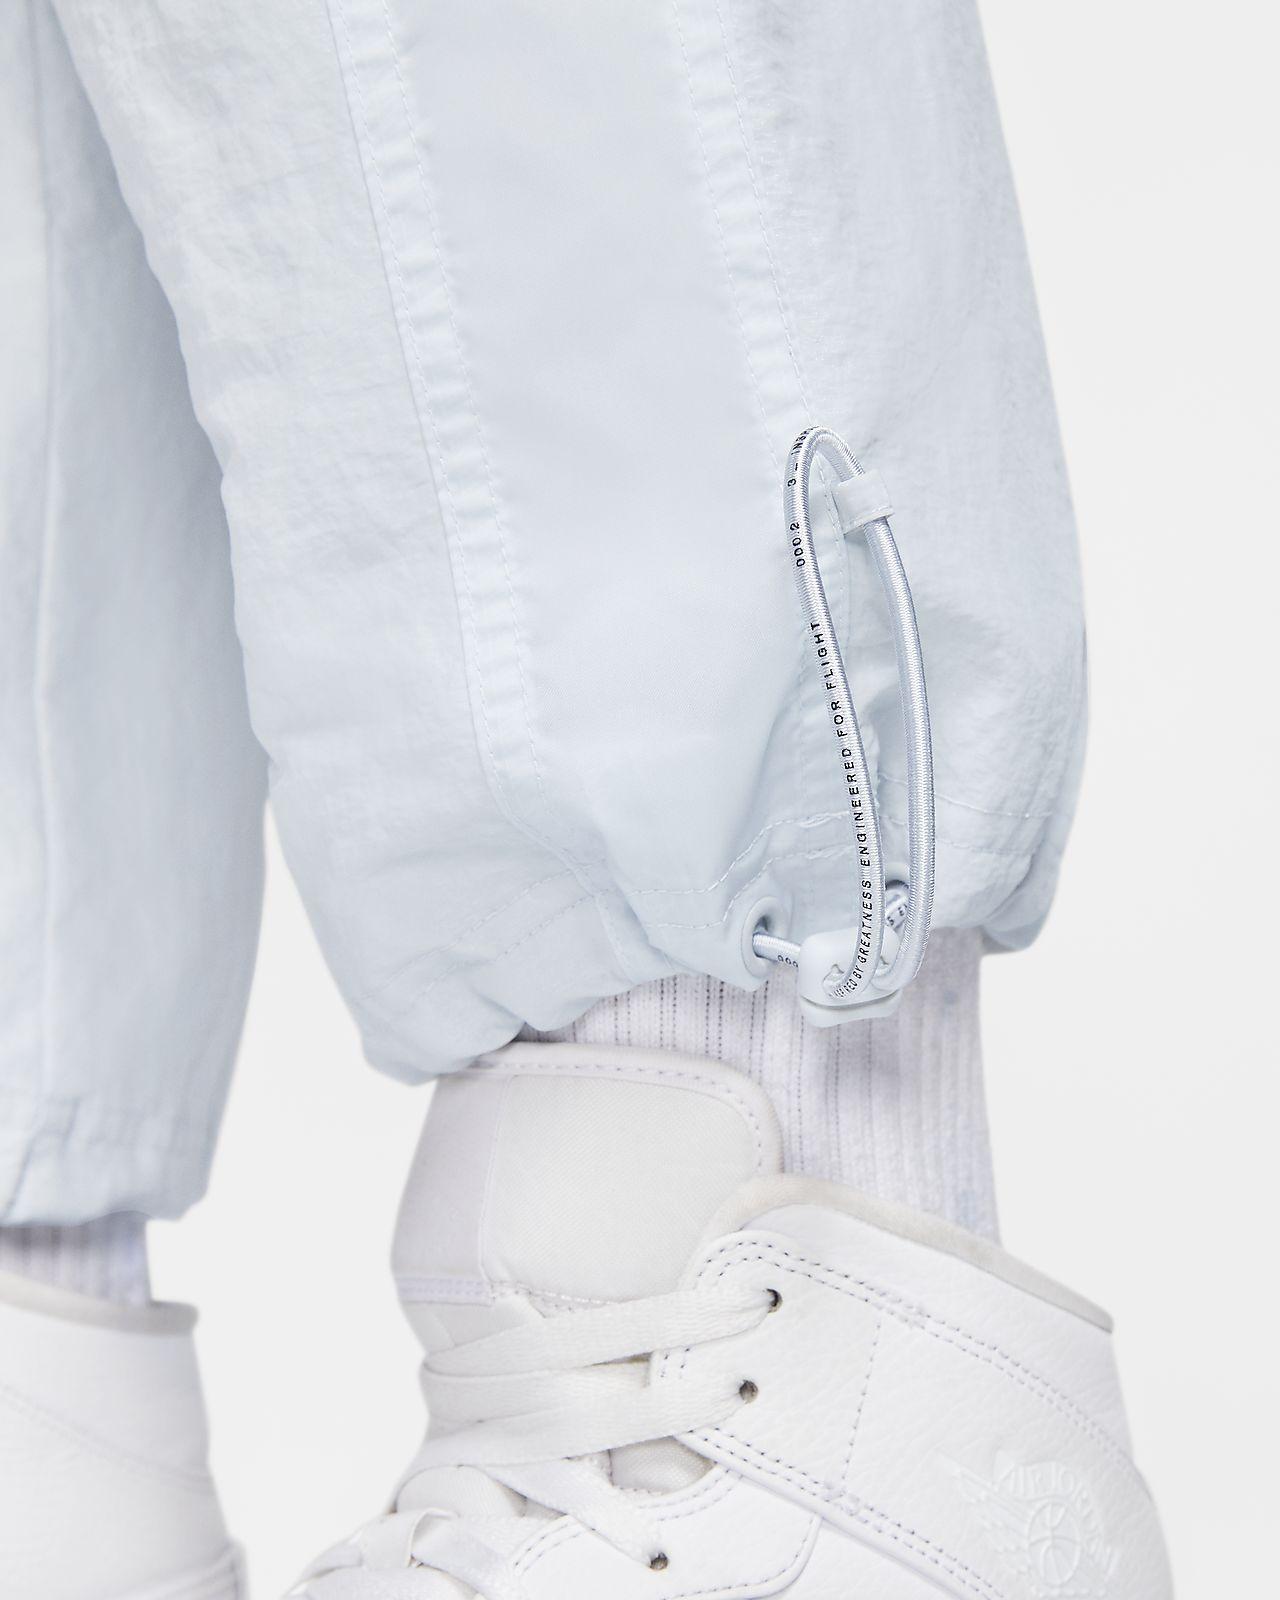 Pantalon en nylon Jordan 23 Engineered